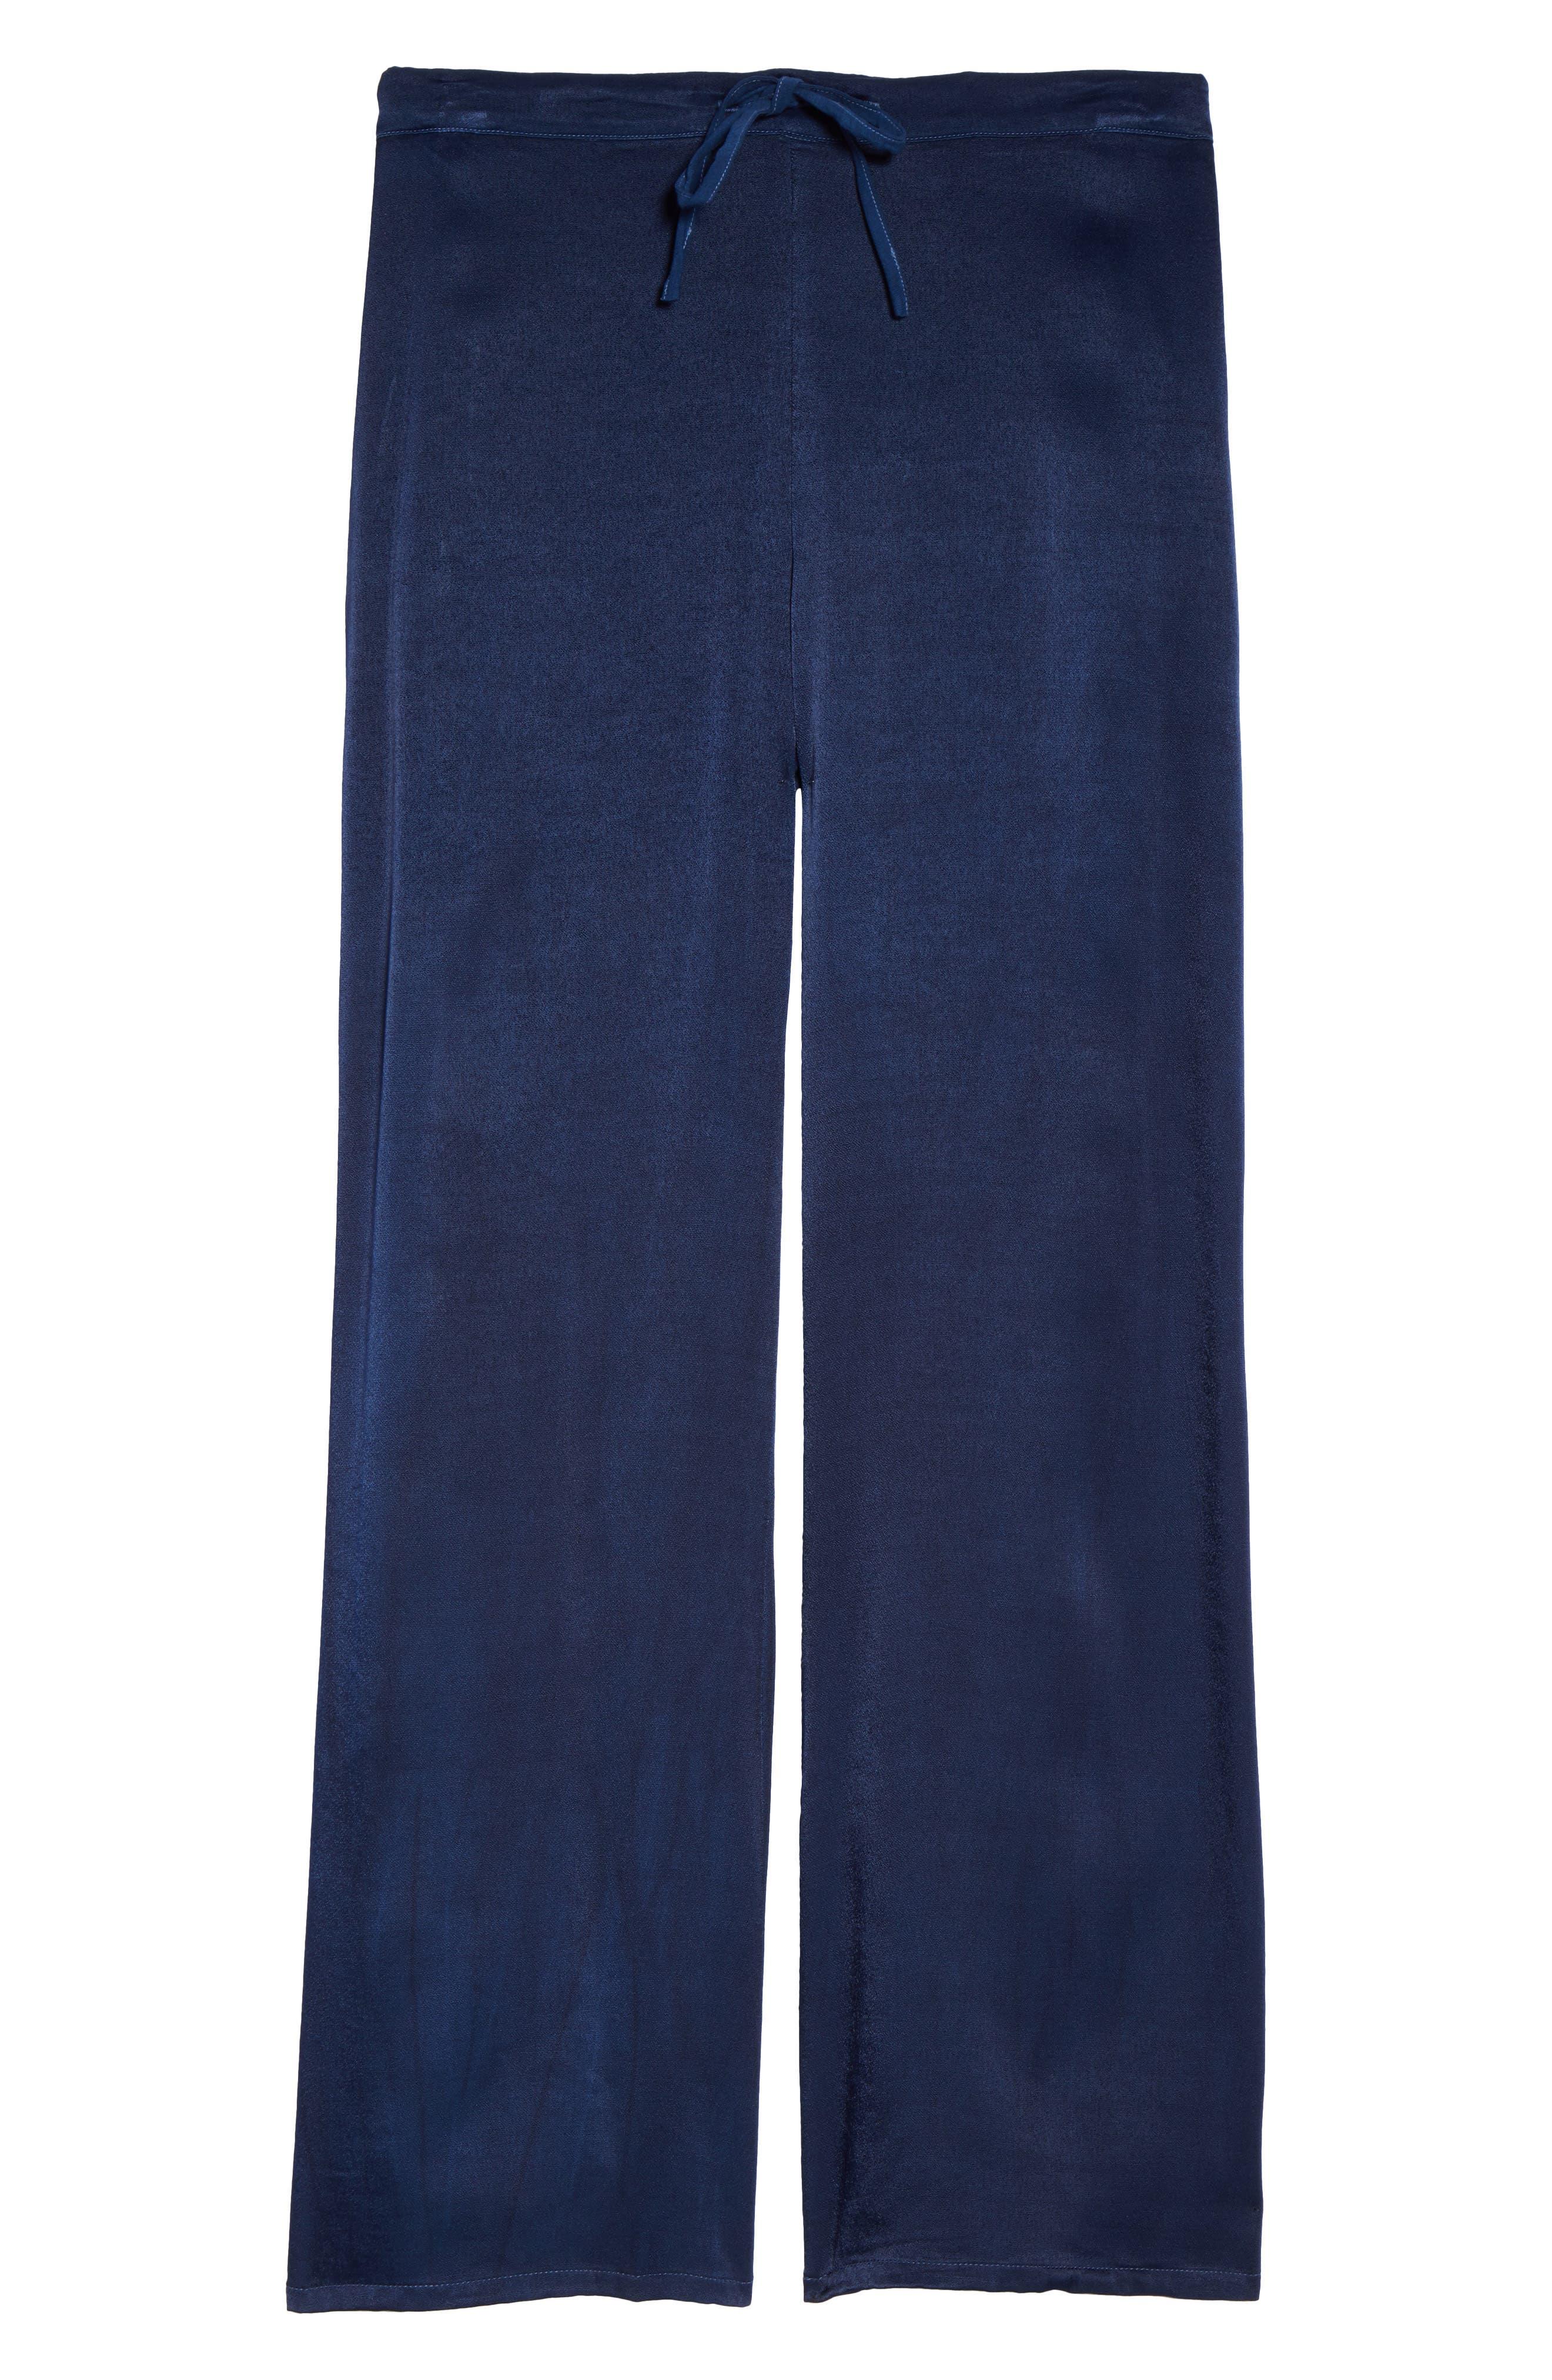 Vela Pajama Pants,                             Alternate thumbnail 7, color,                             Oxford